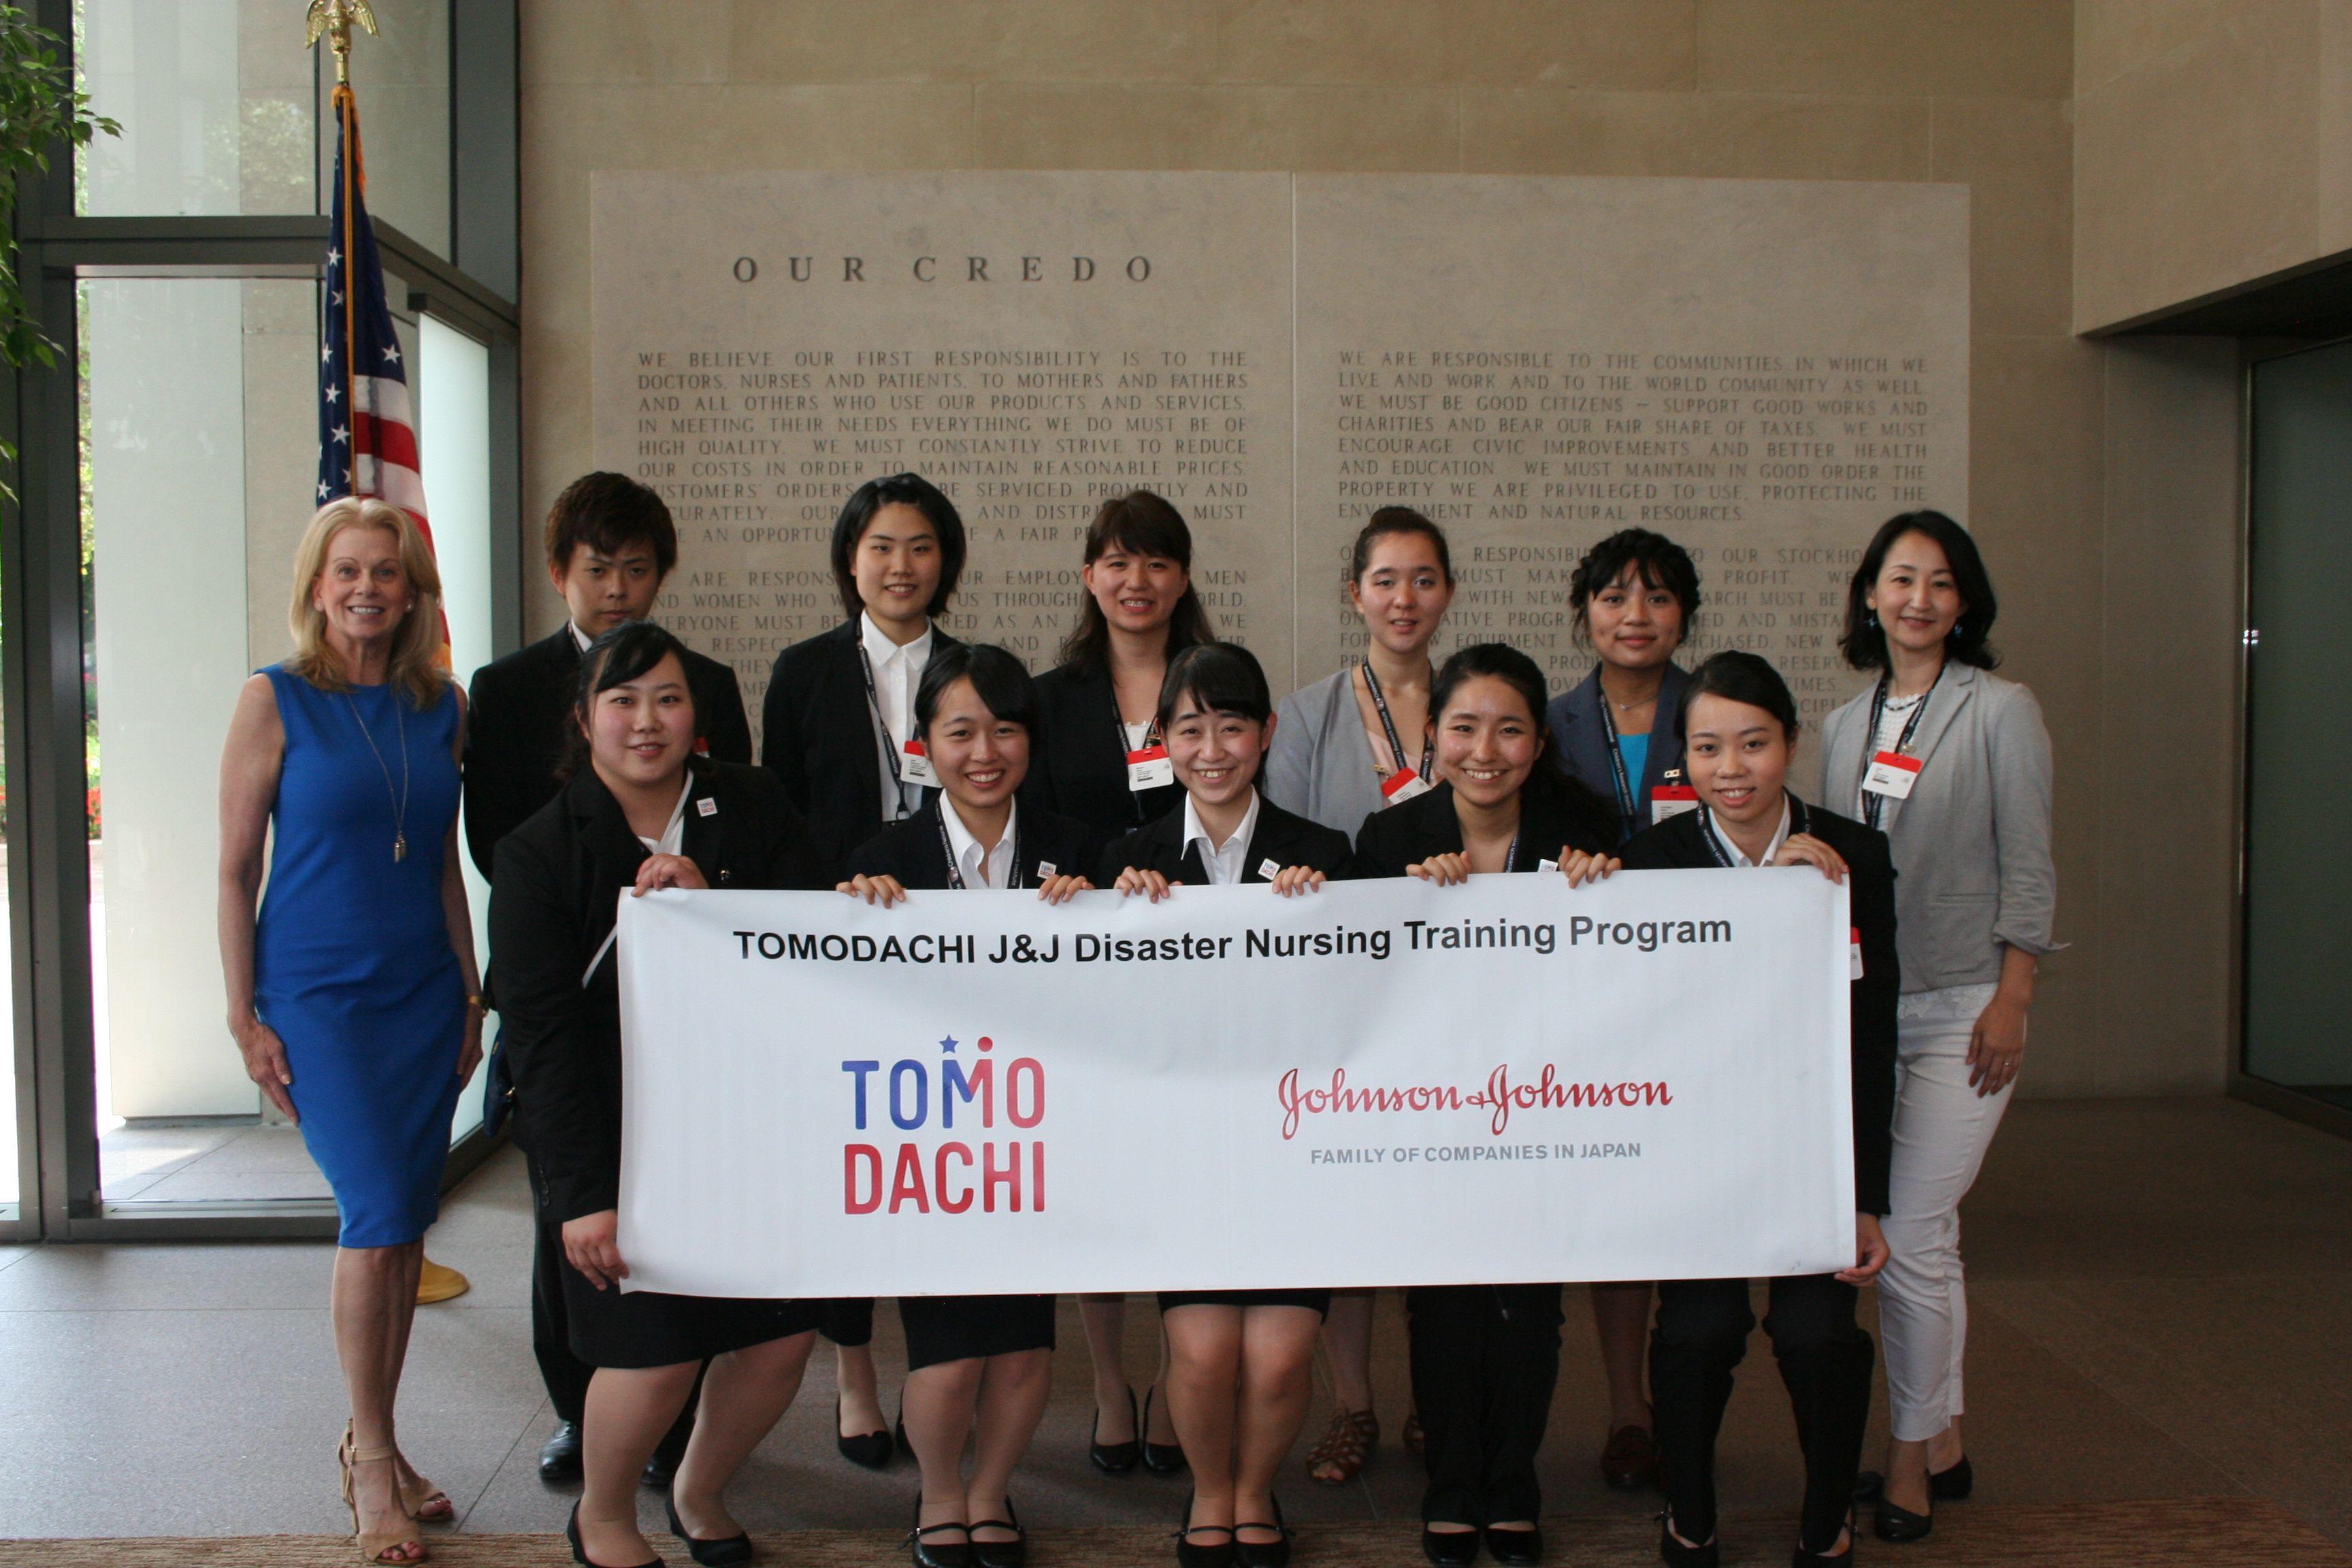 We loved meeting these Japanese student nurses